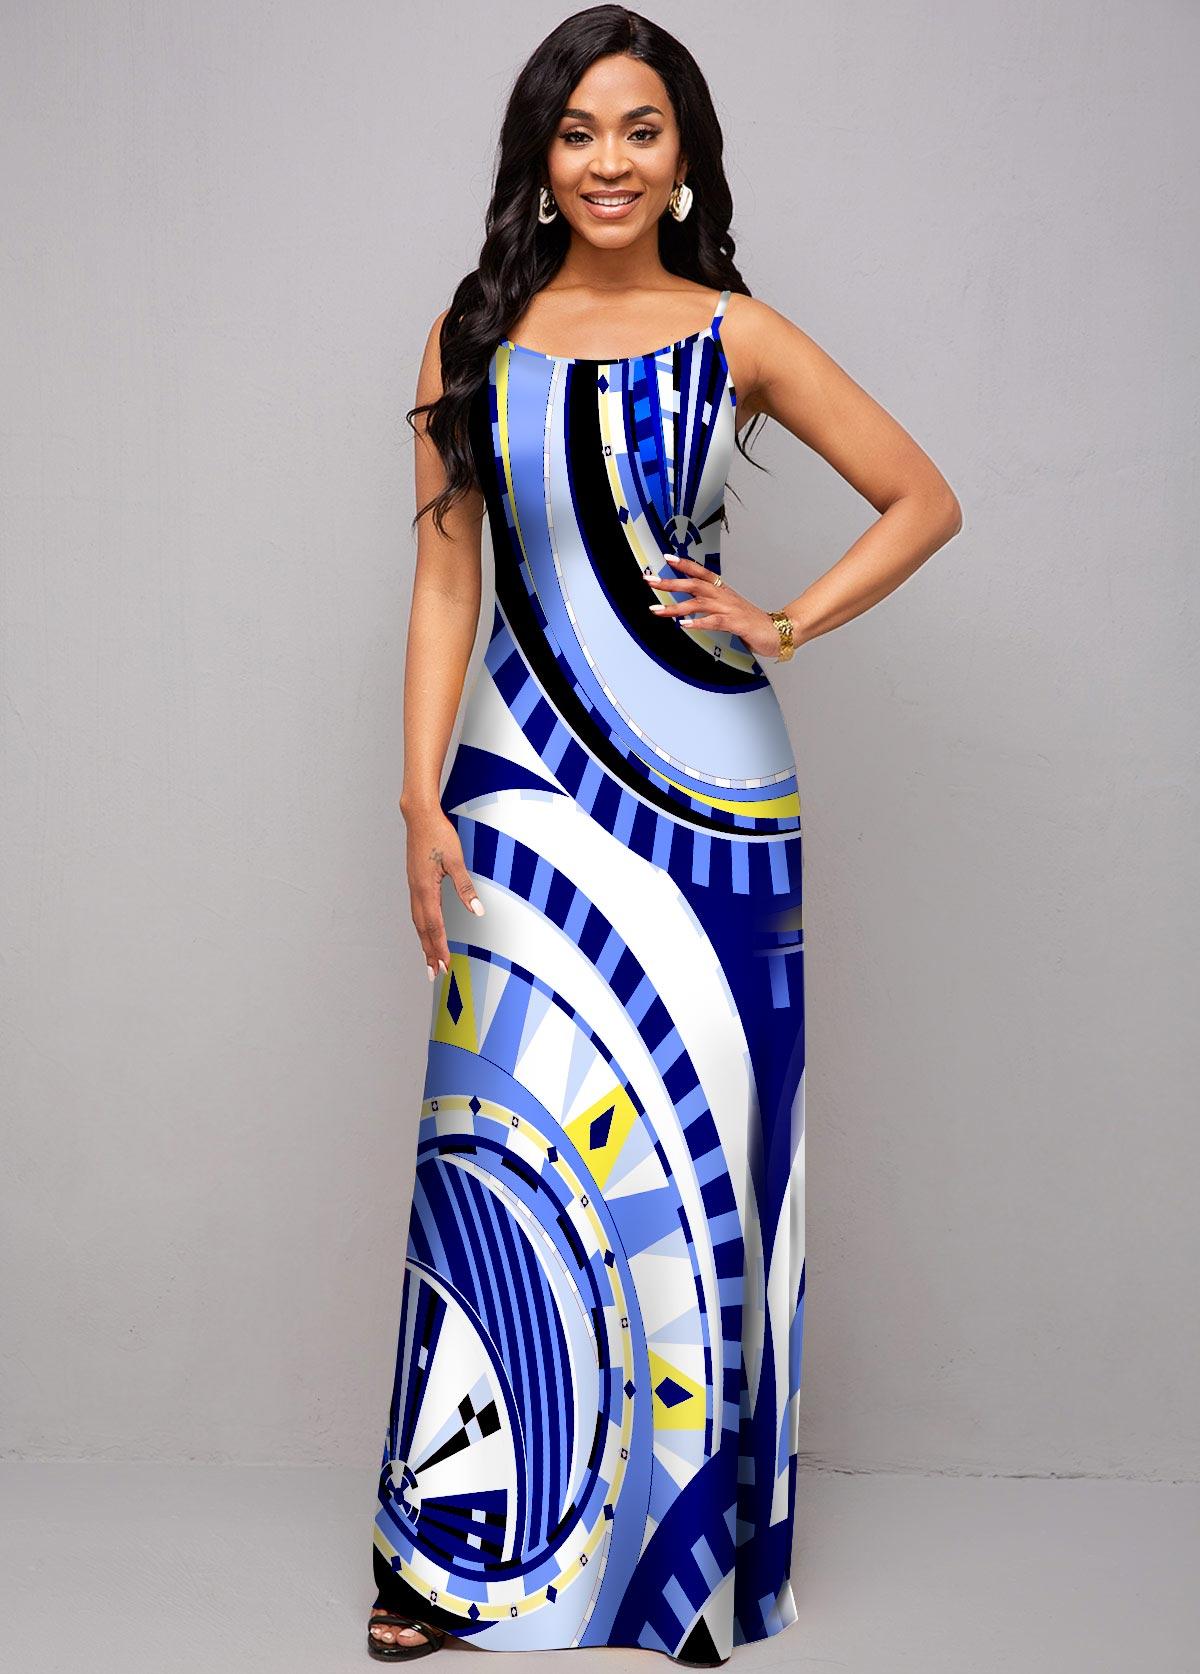 ROTITA Geometric Print Spaghetti Strap High Waist Dress